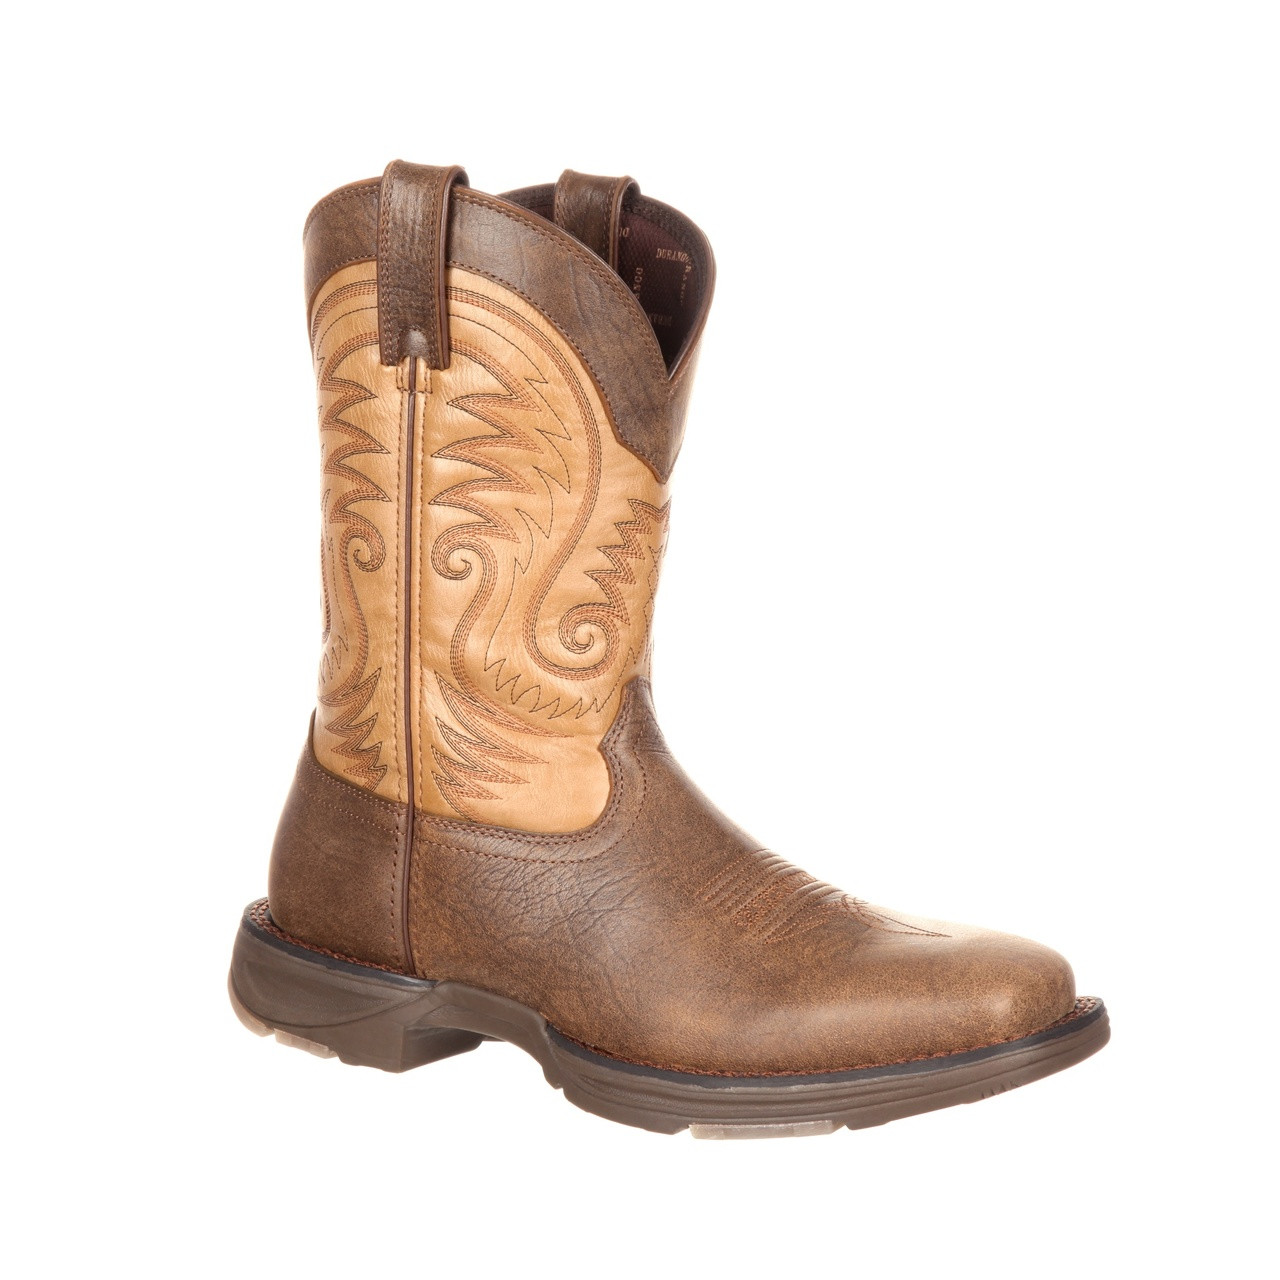 Durango UltraLite Western Boots DDB0109